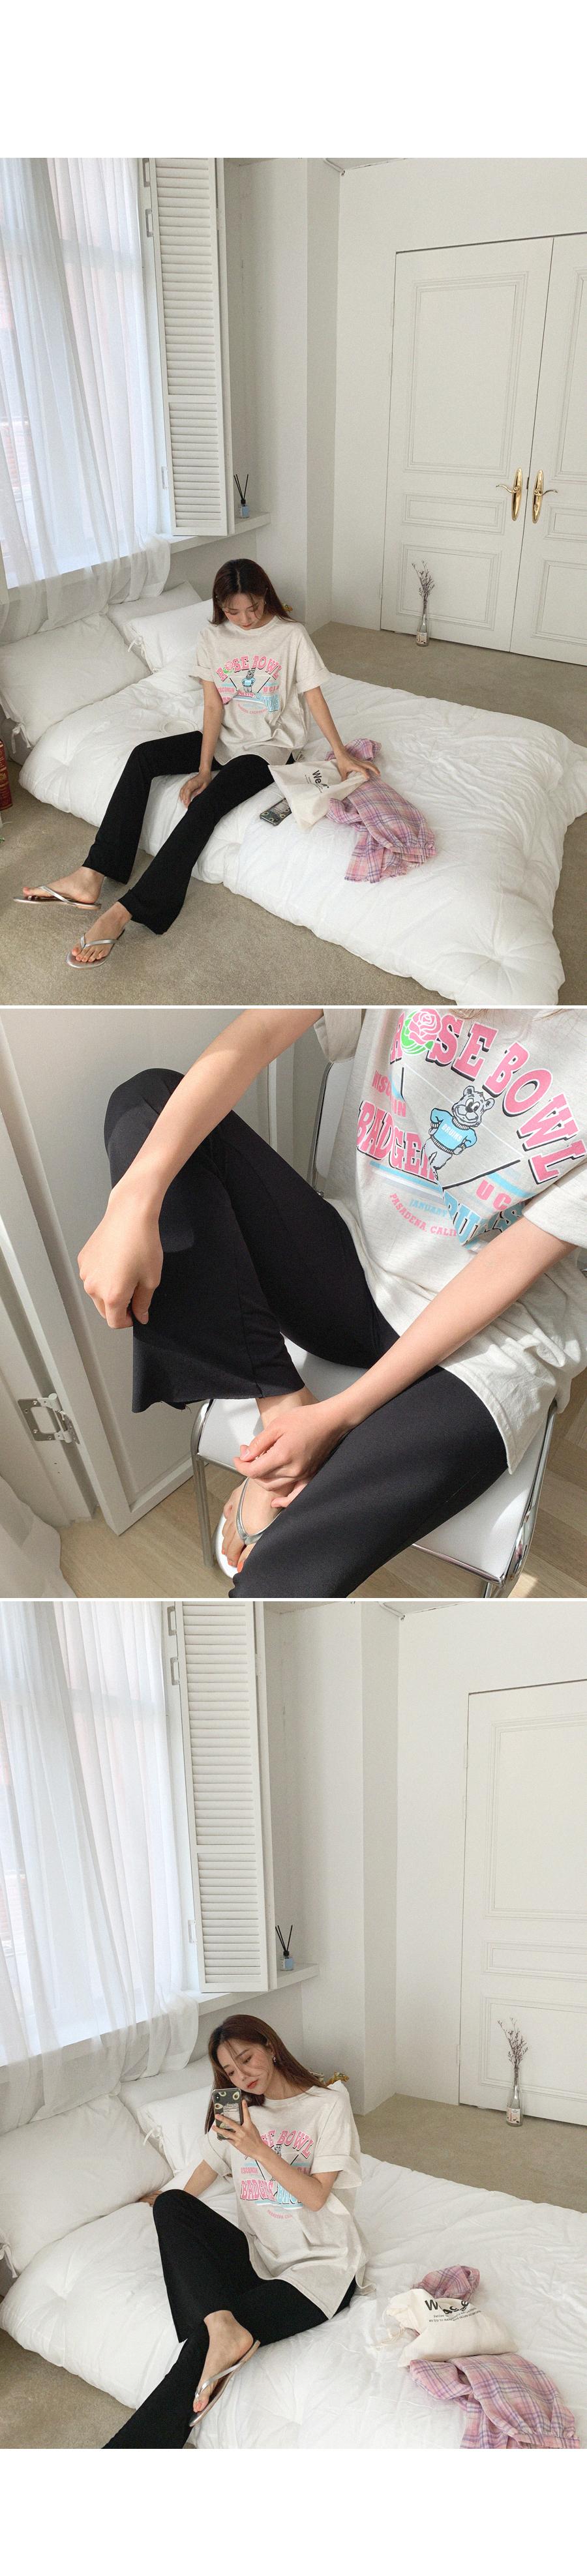 Drug Flared leggings pants